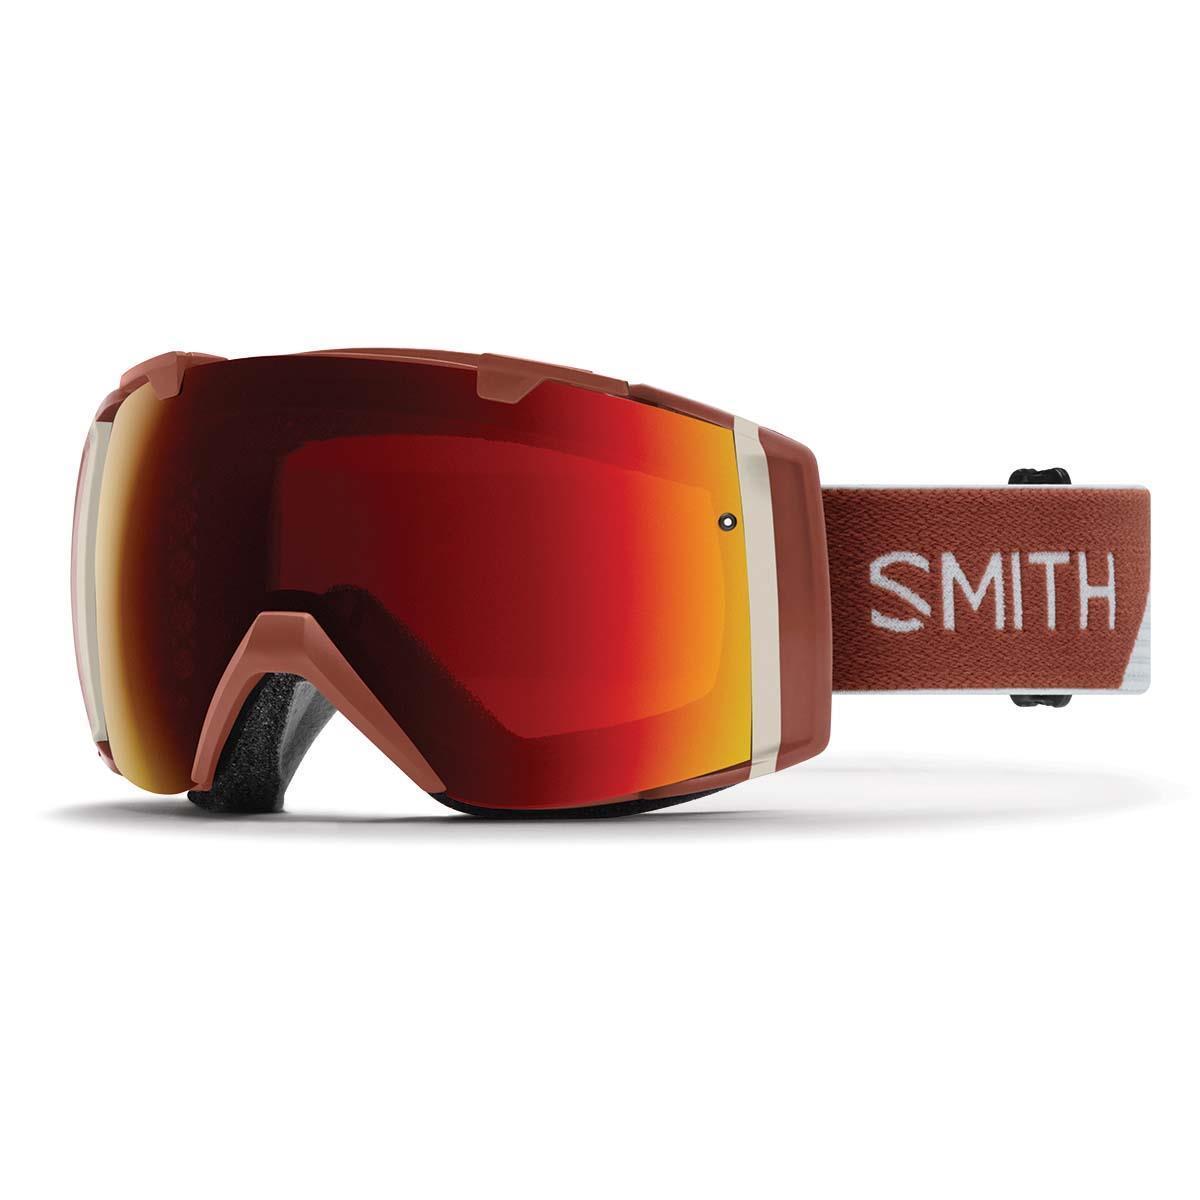 2f7bc0bbf9 Smith Optics I O Adult Snow Goggles